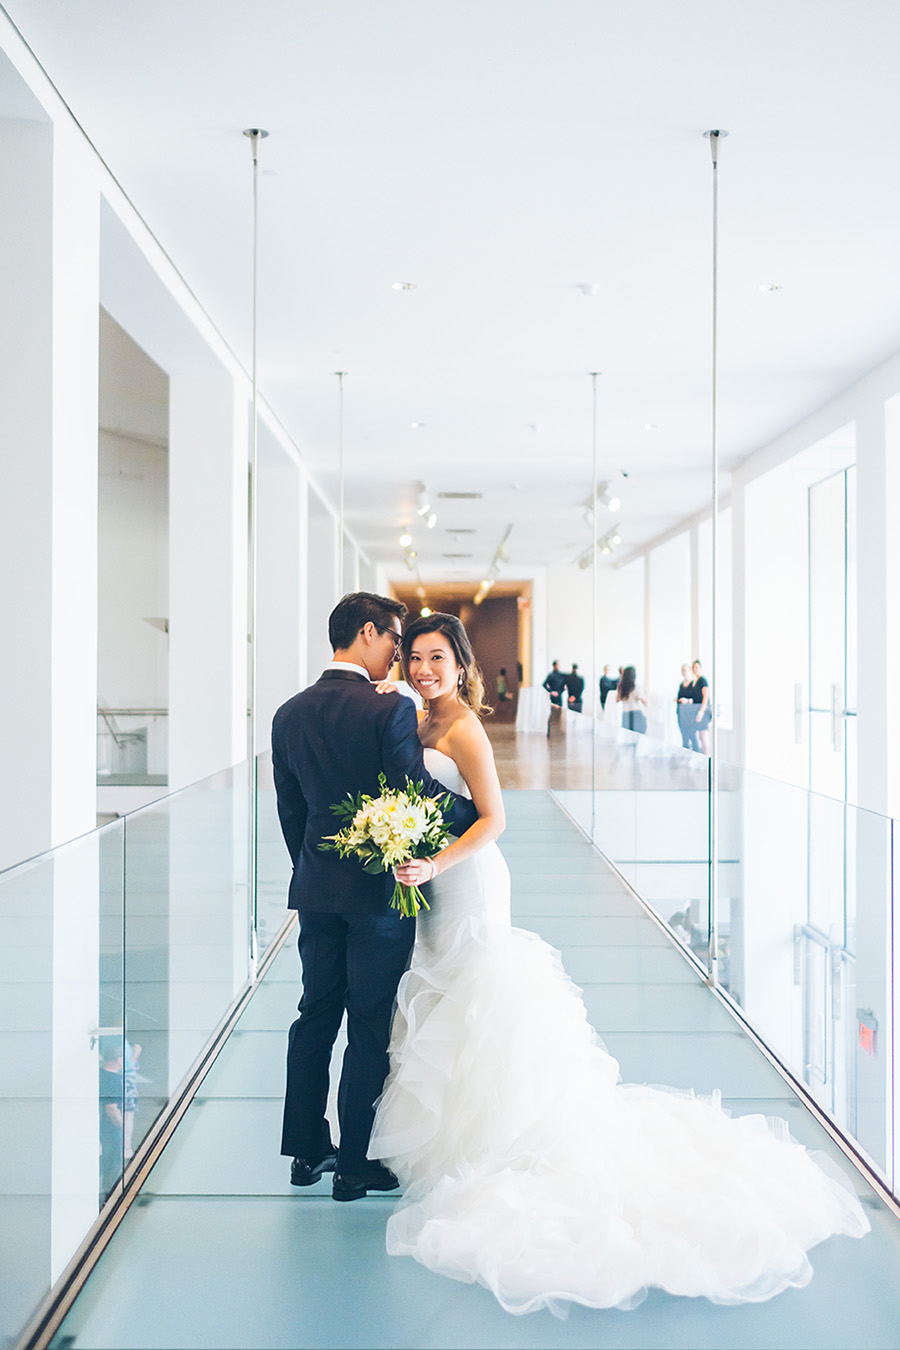 JUDITH-IRVING-NYC-WEDDING-BRIDEGROOM-CYNTHIACHUNG-0014.jpg